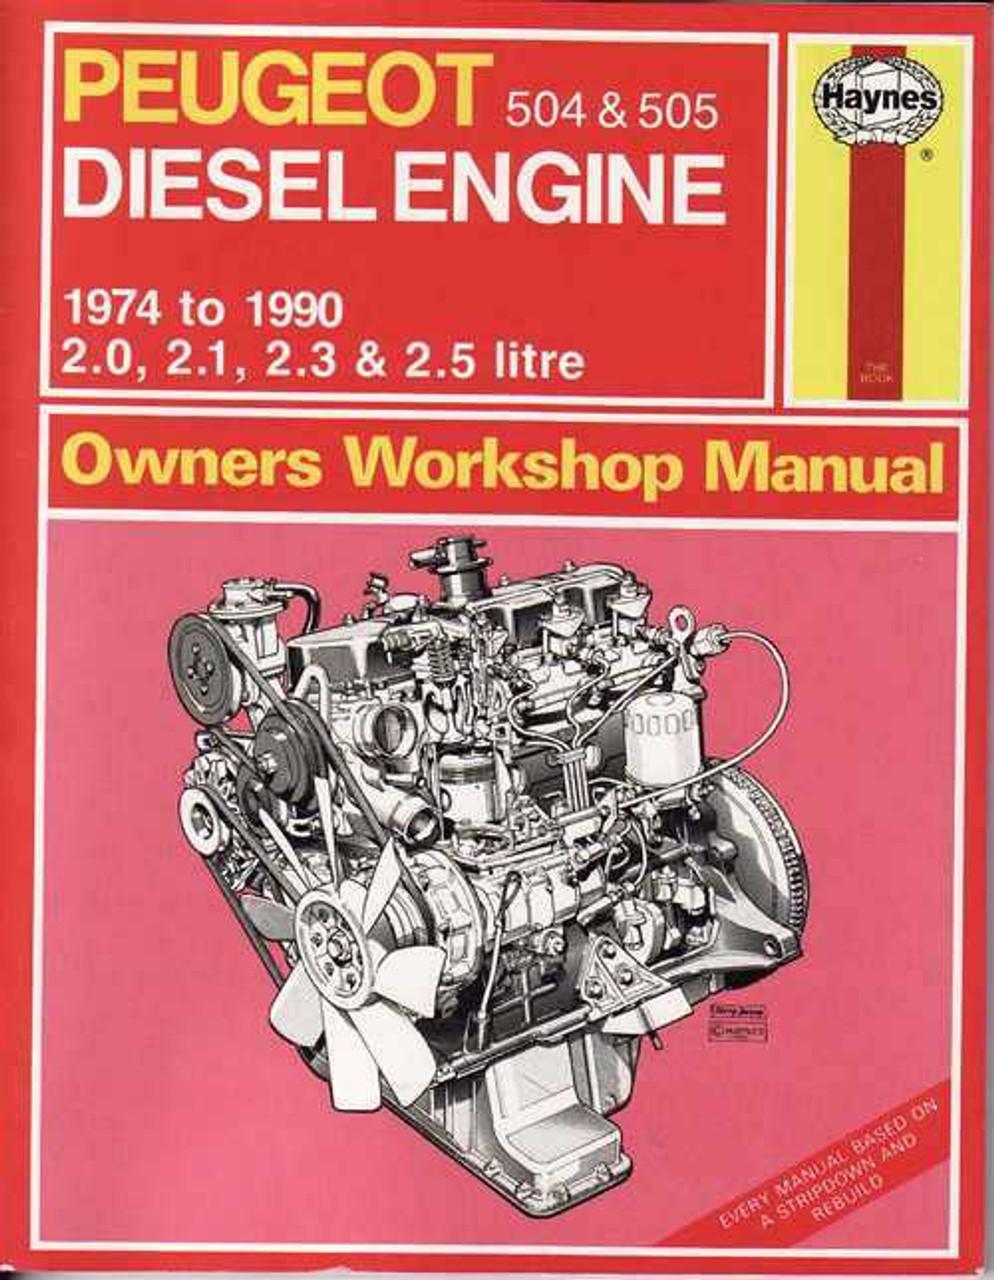 peugeot 504 amp 505 diesel engine 1974 1990 workshop manual rh automotobookshop com au 1985 Peugeot 505 Turbo Peugeot 505 Turbo